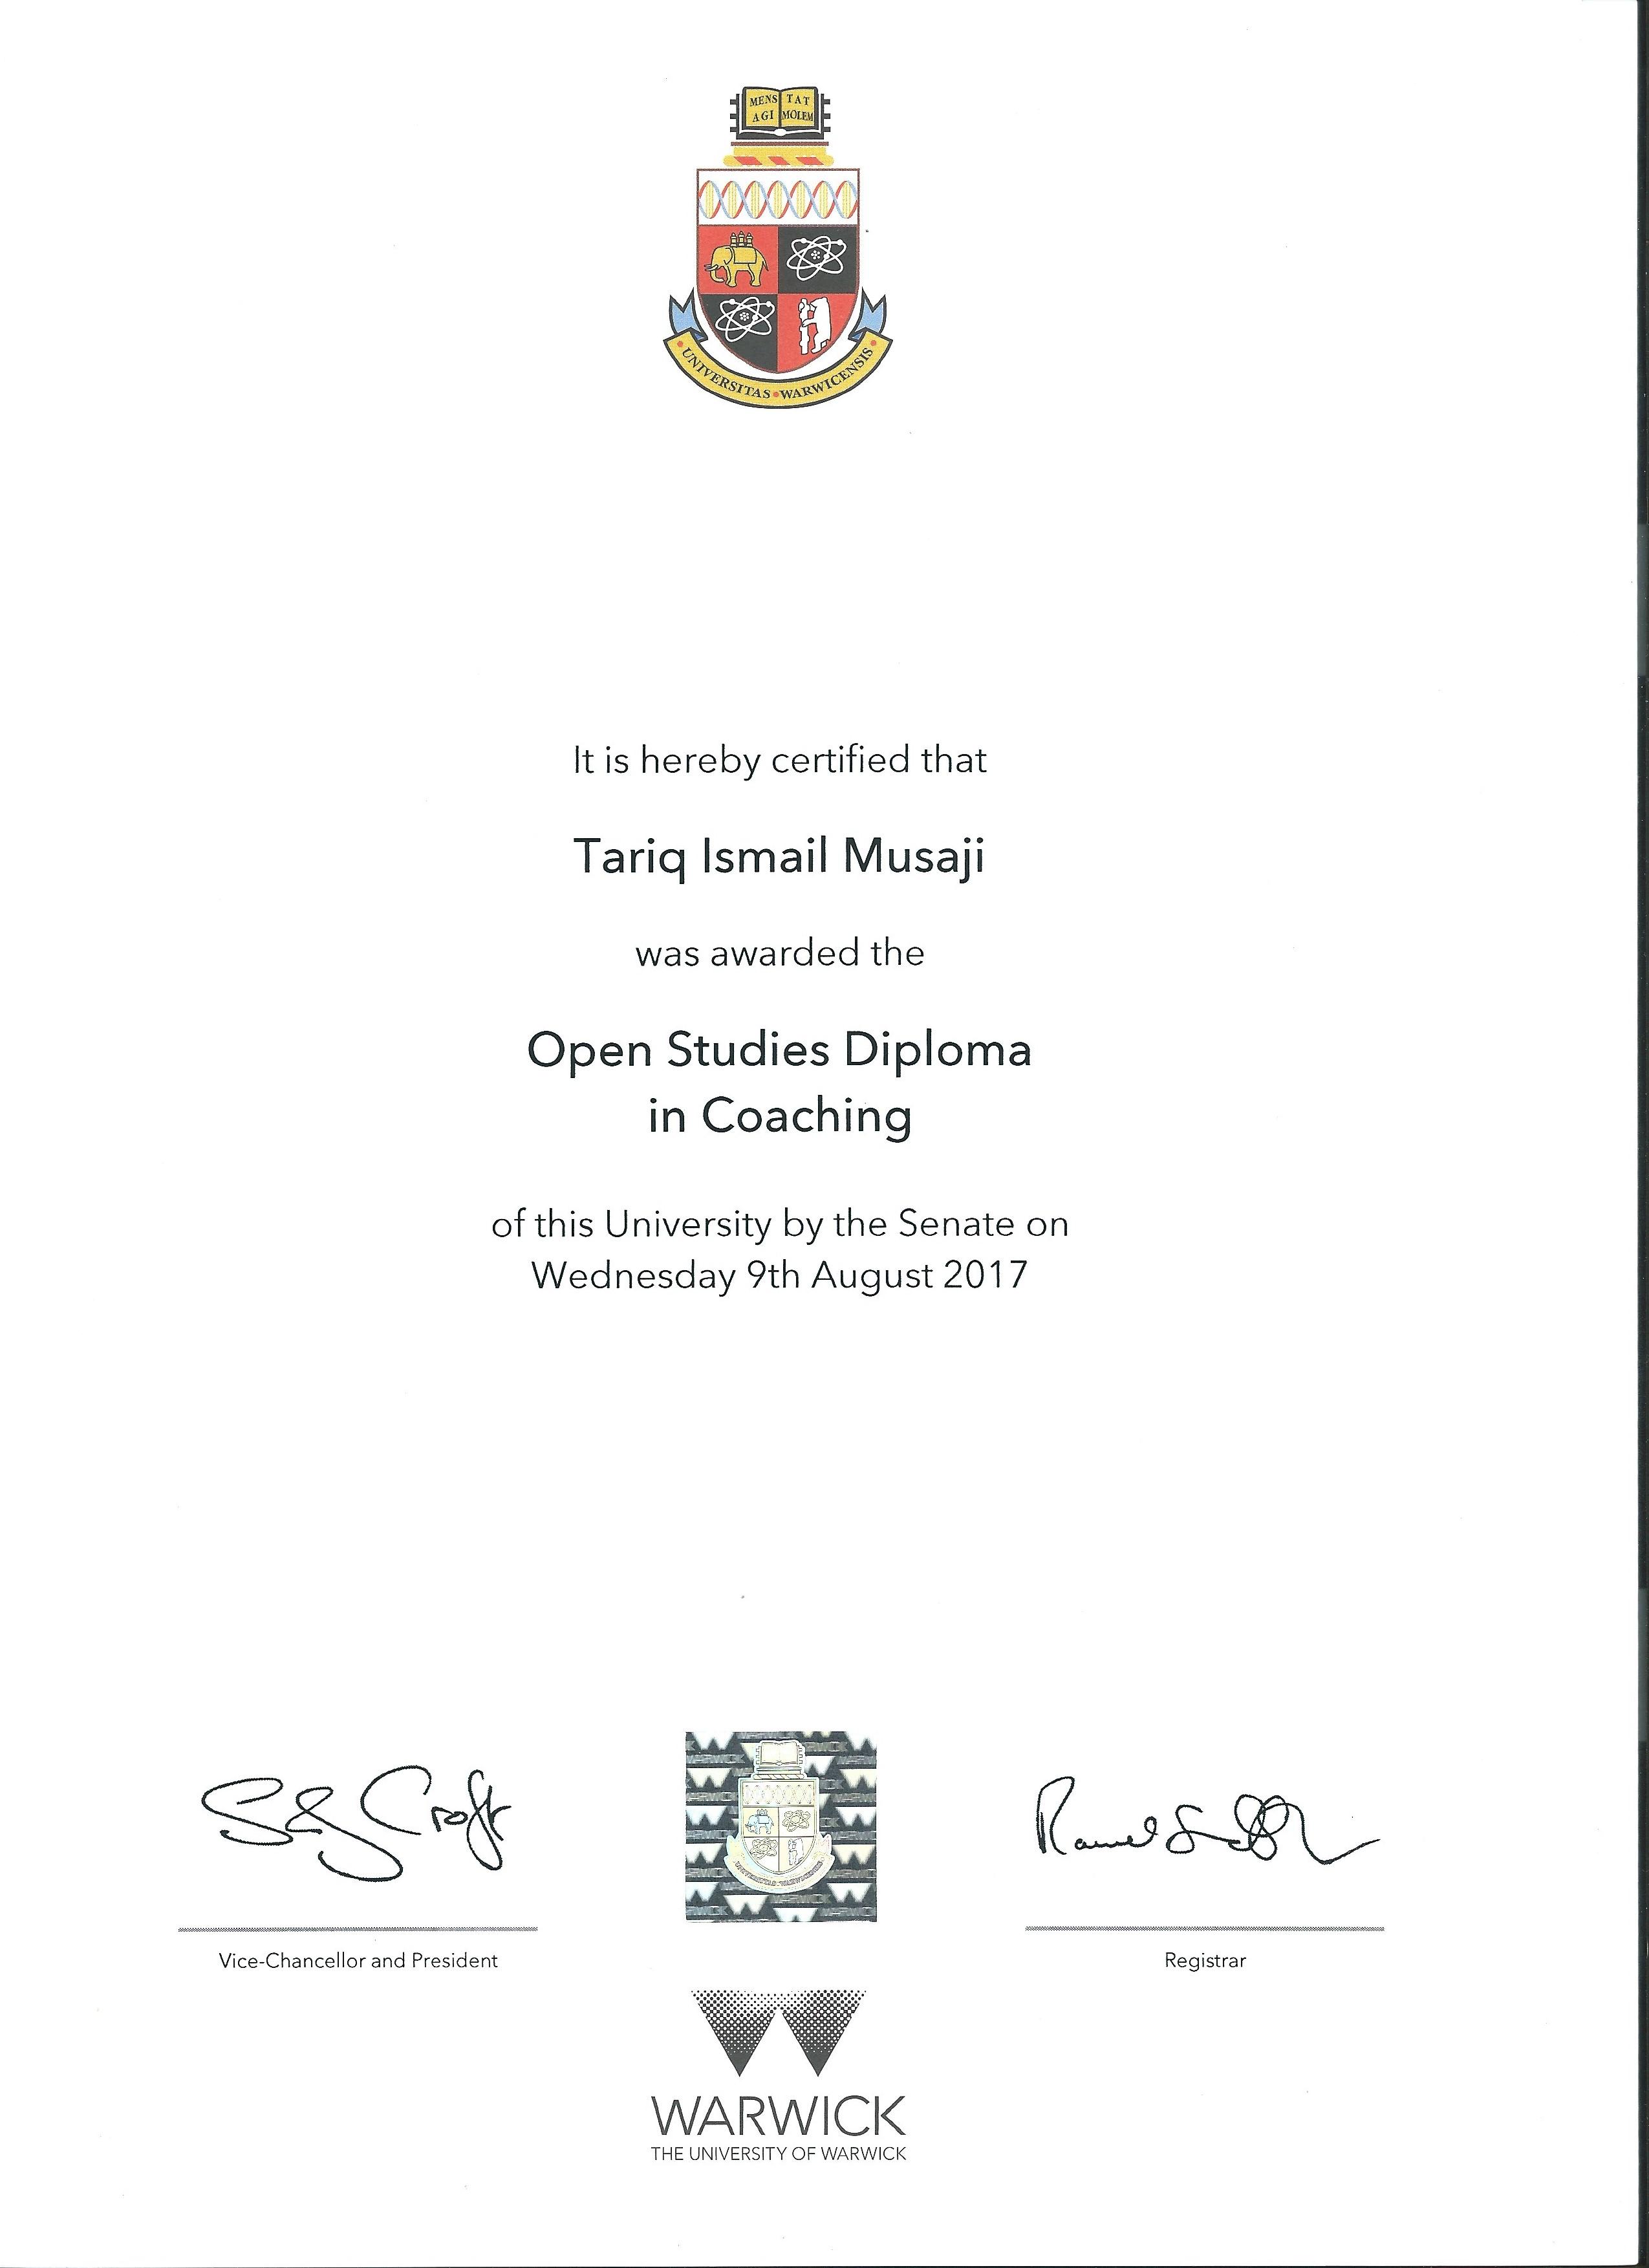 Diploma in Coaching